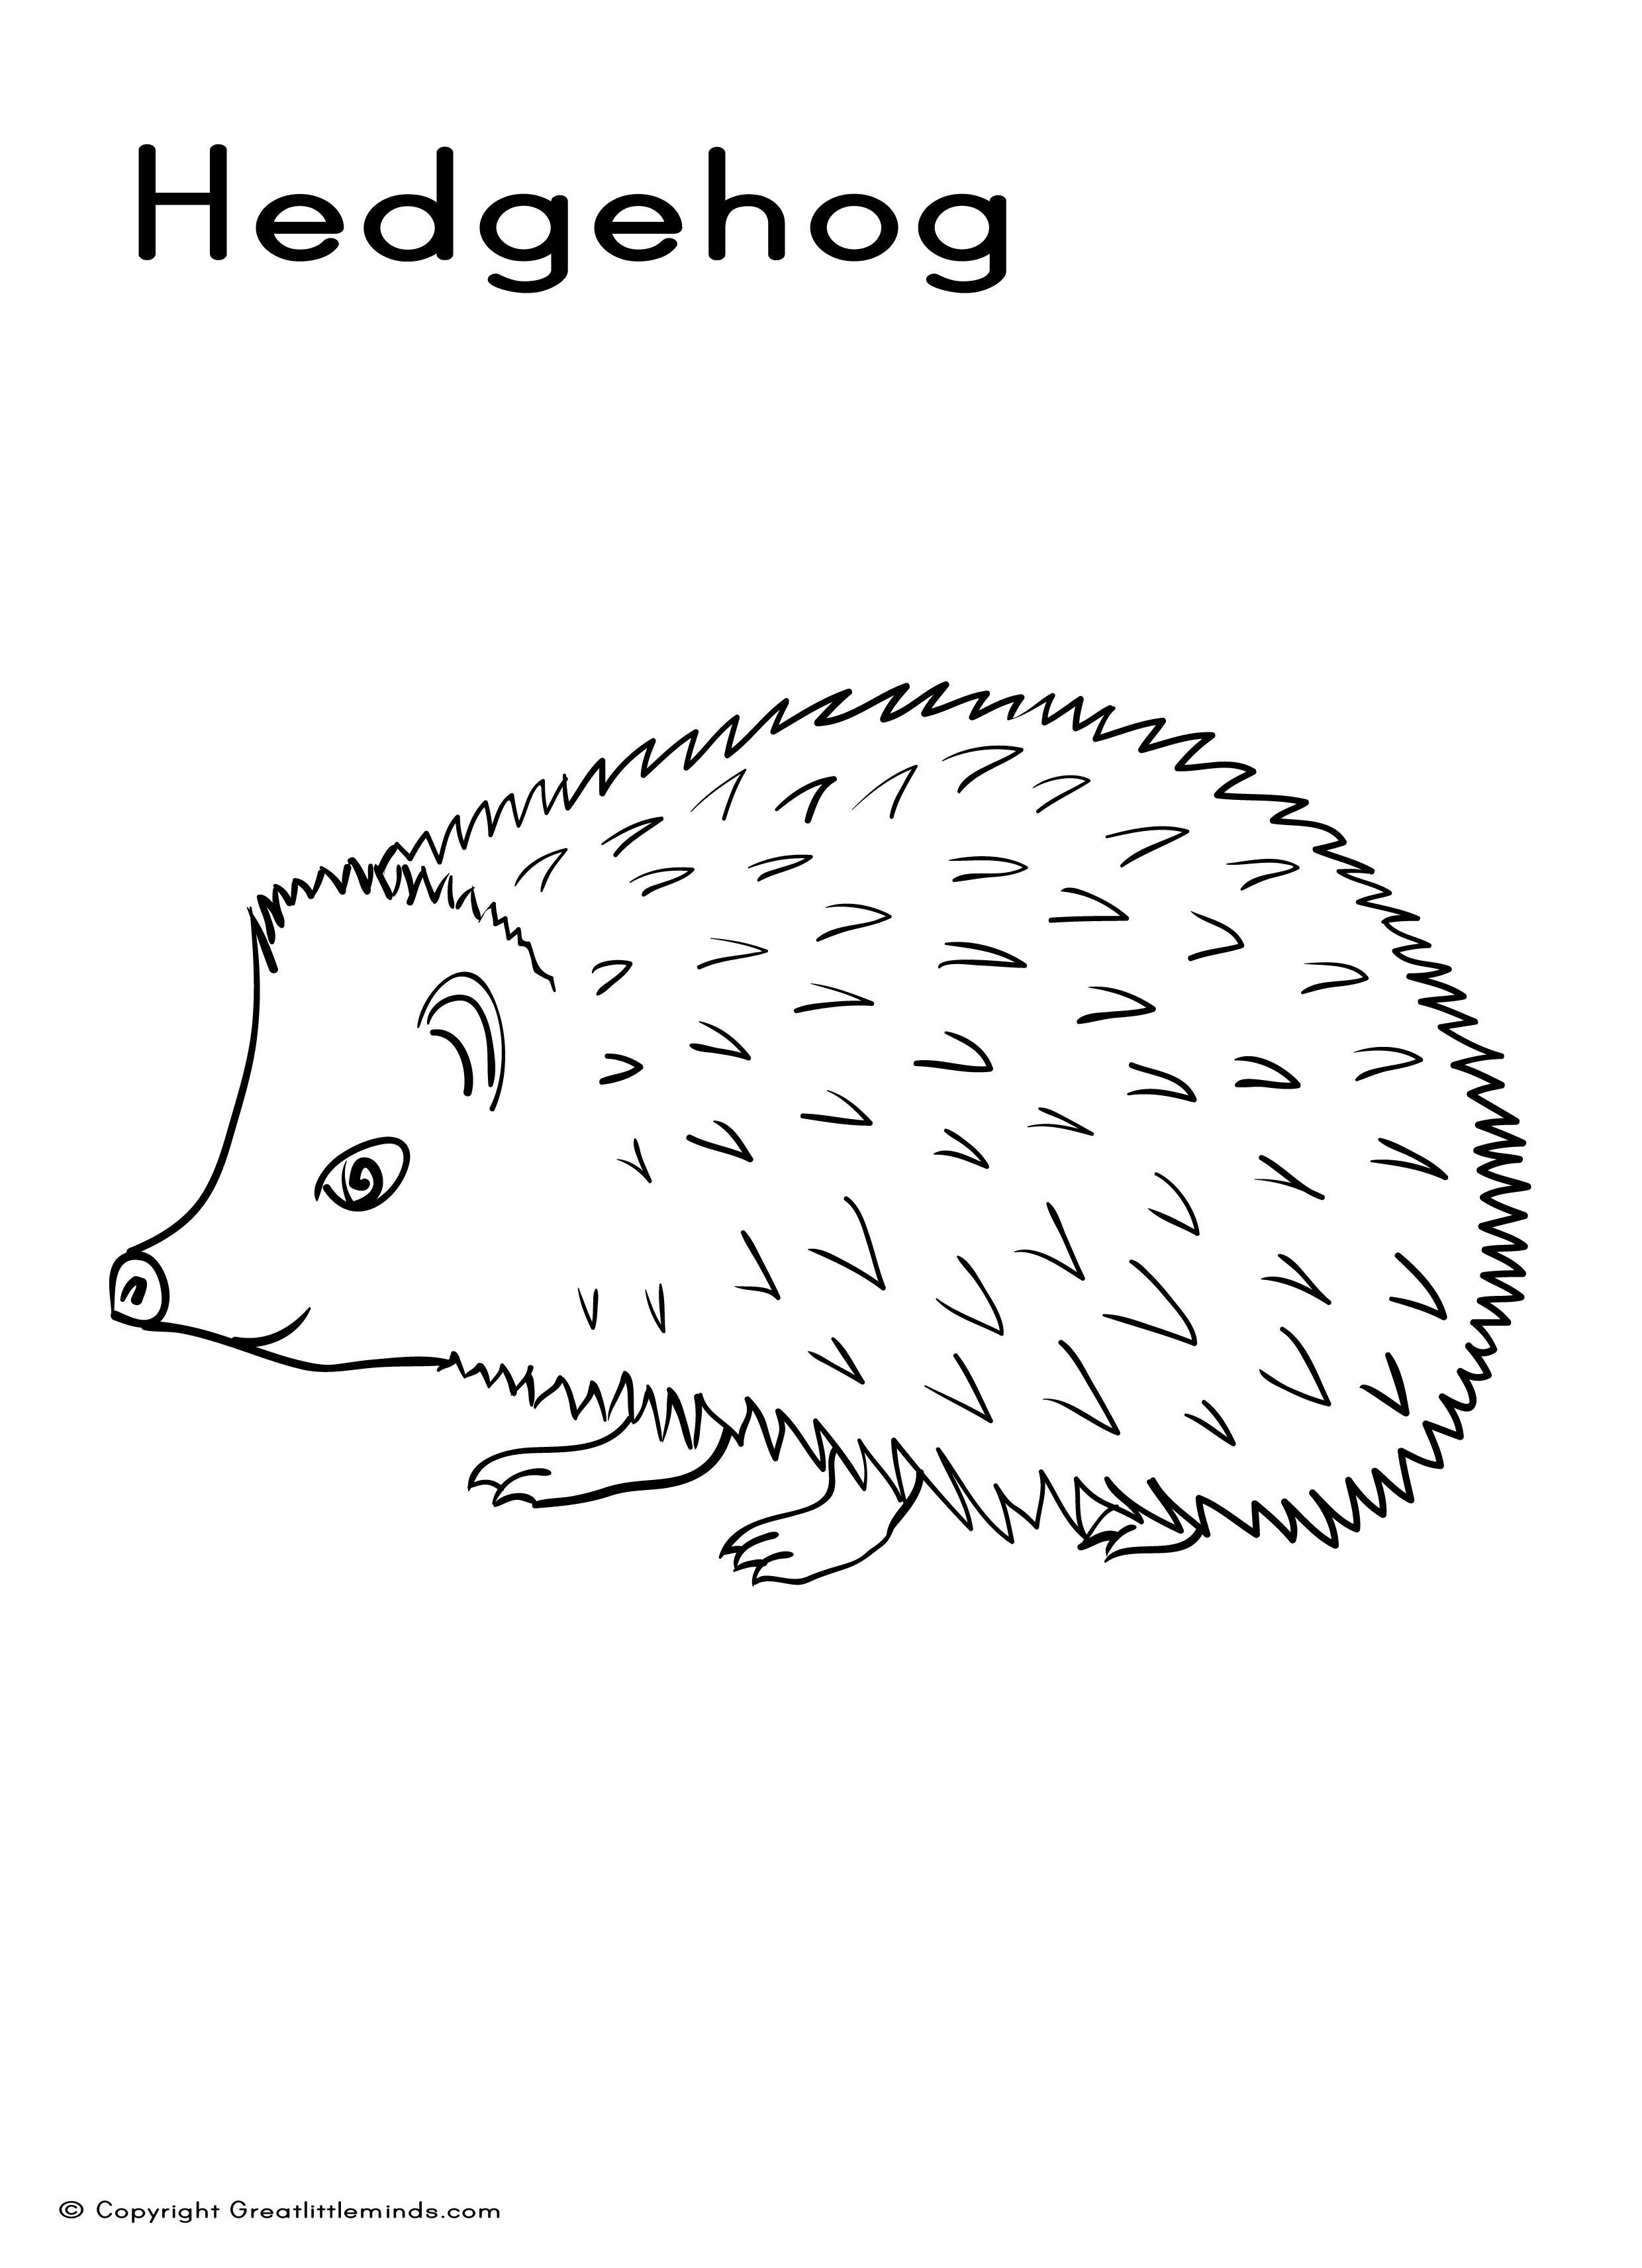 colouring picture hedgehog hedgehog 4 animals printable coloring pages hedgehog colouring picture